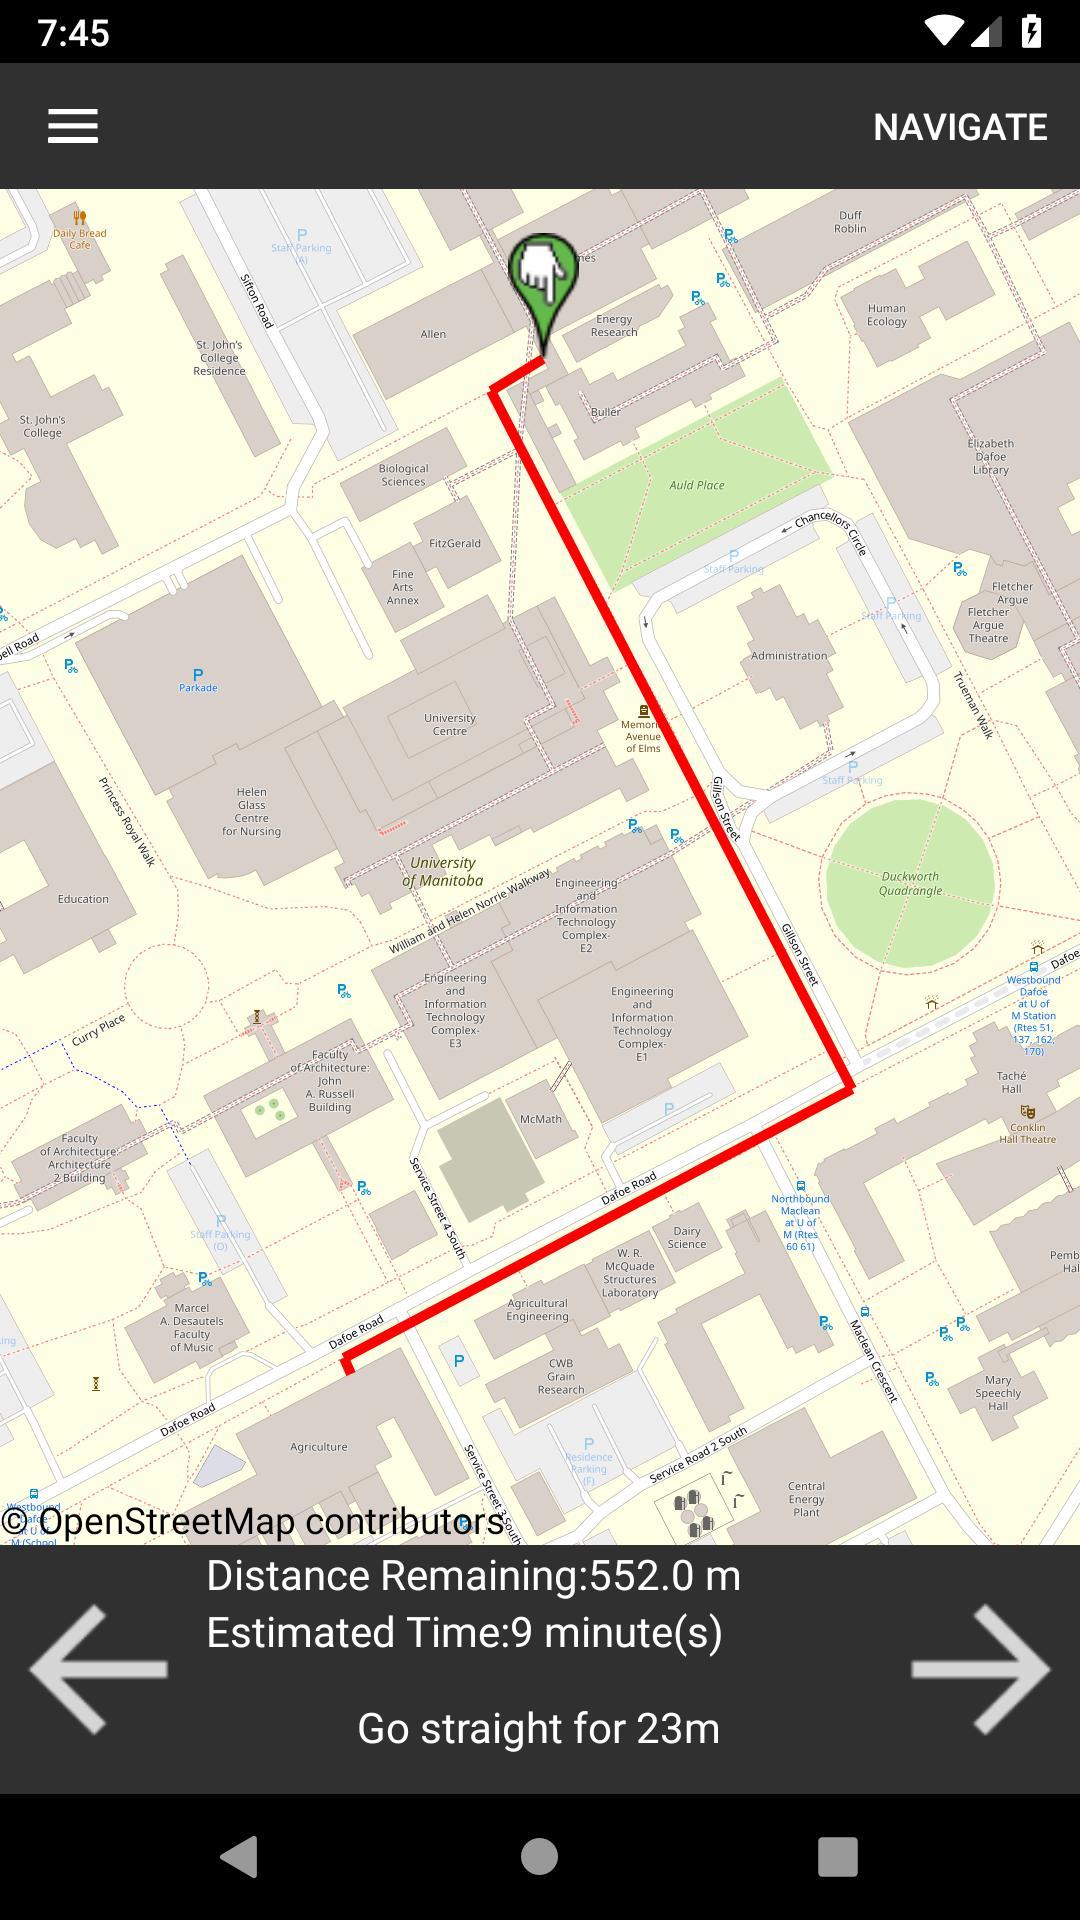 University Of Manitoba Campus Map University of Manitoba Campus Map for Android   APK Download